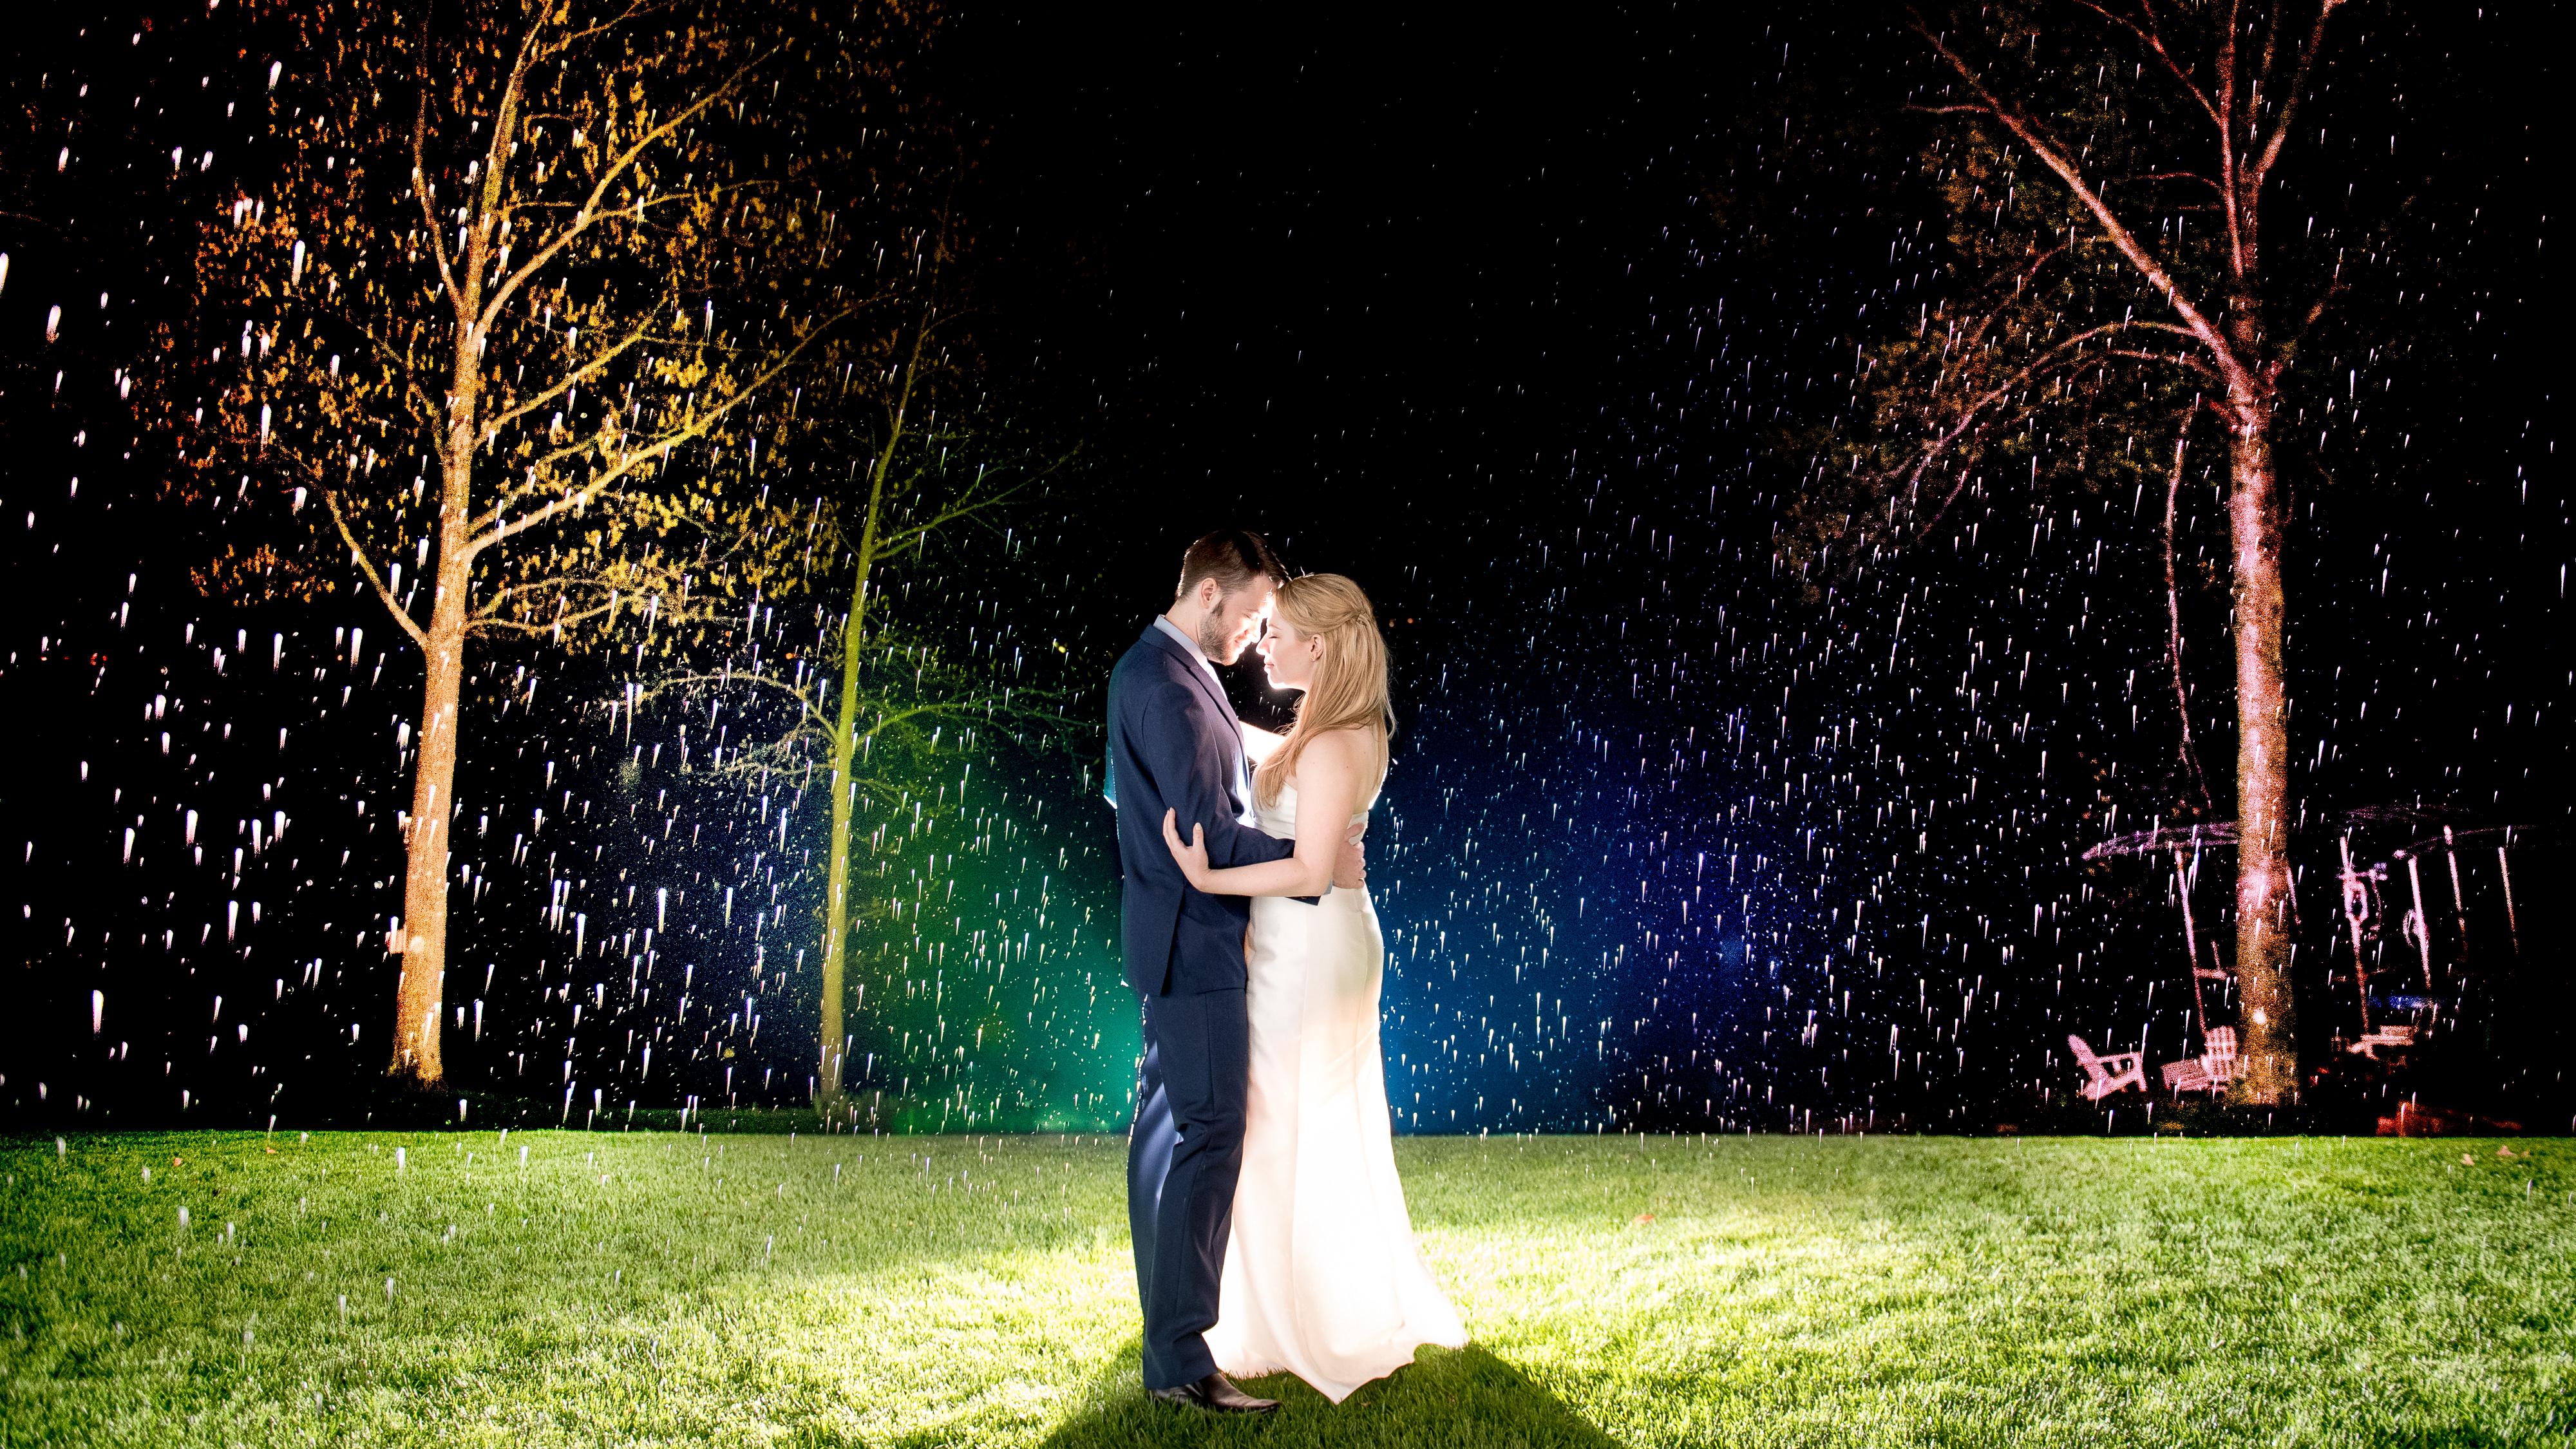 Rainbow rain backlit wedding portrait